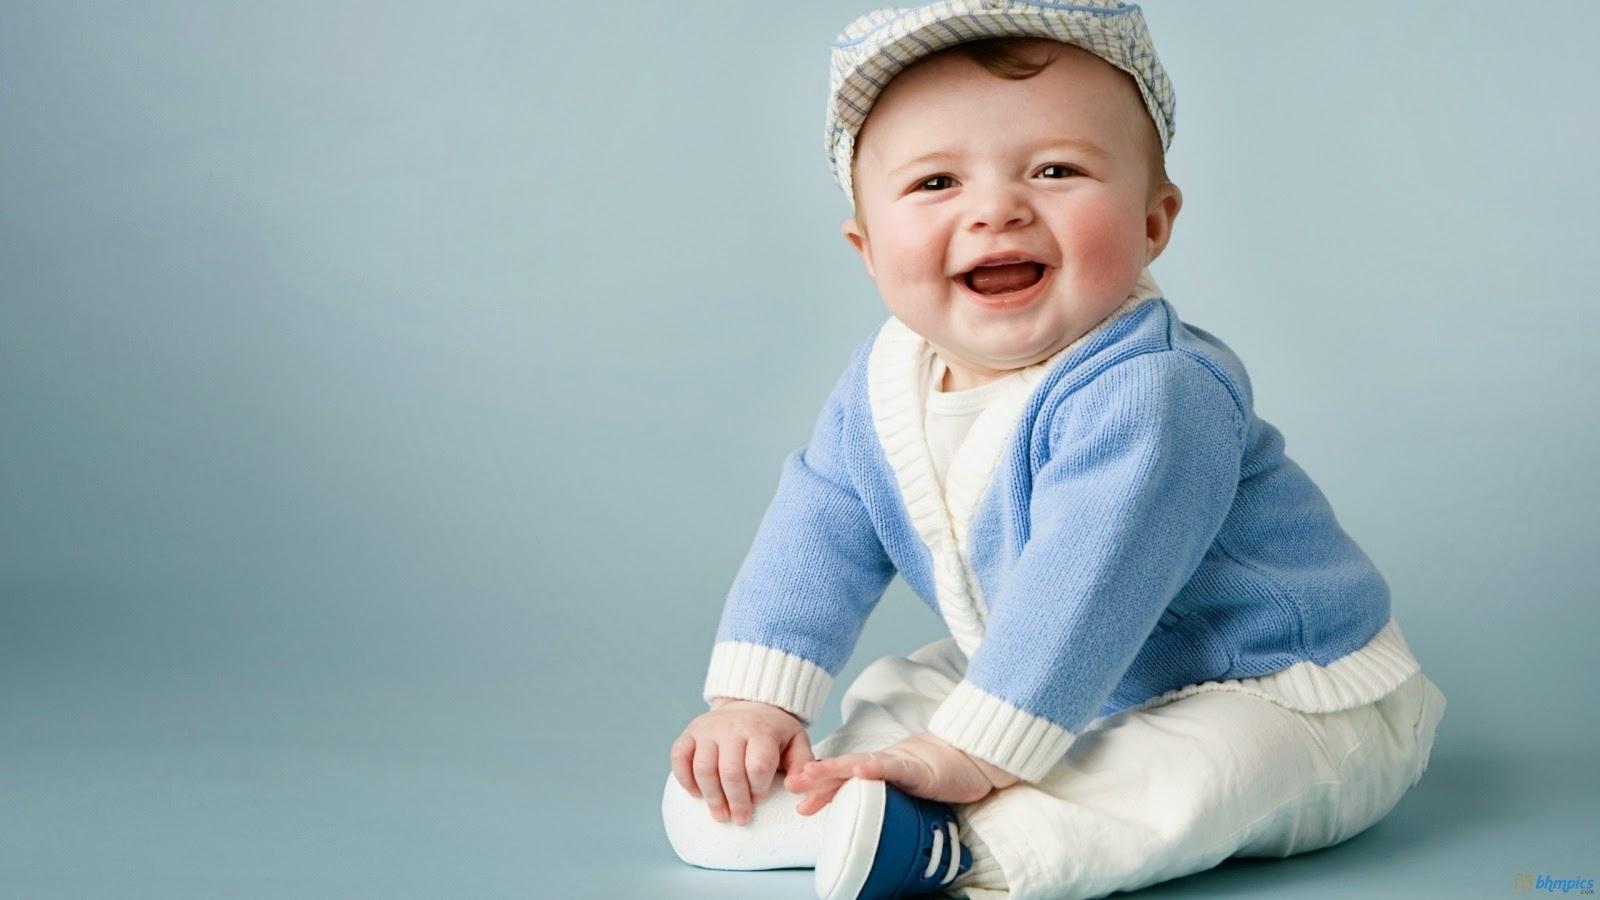 Cuty Baby Photo